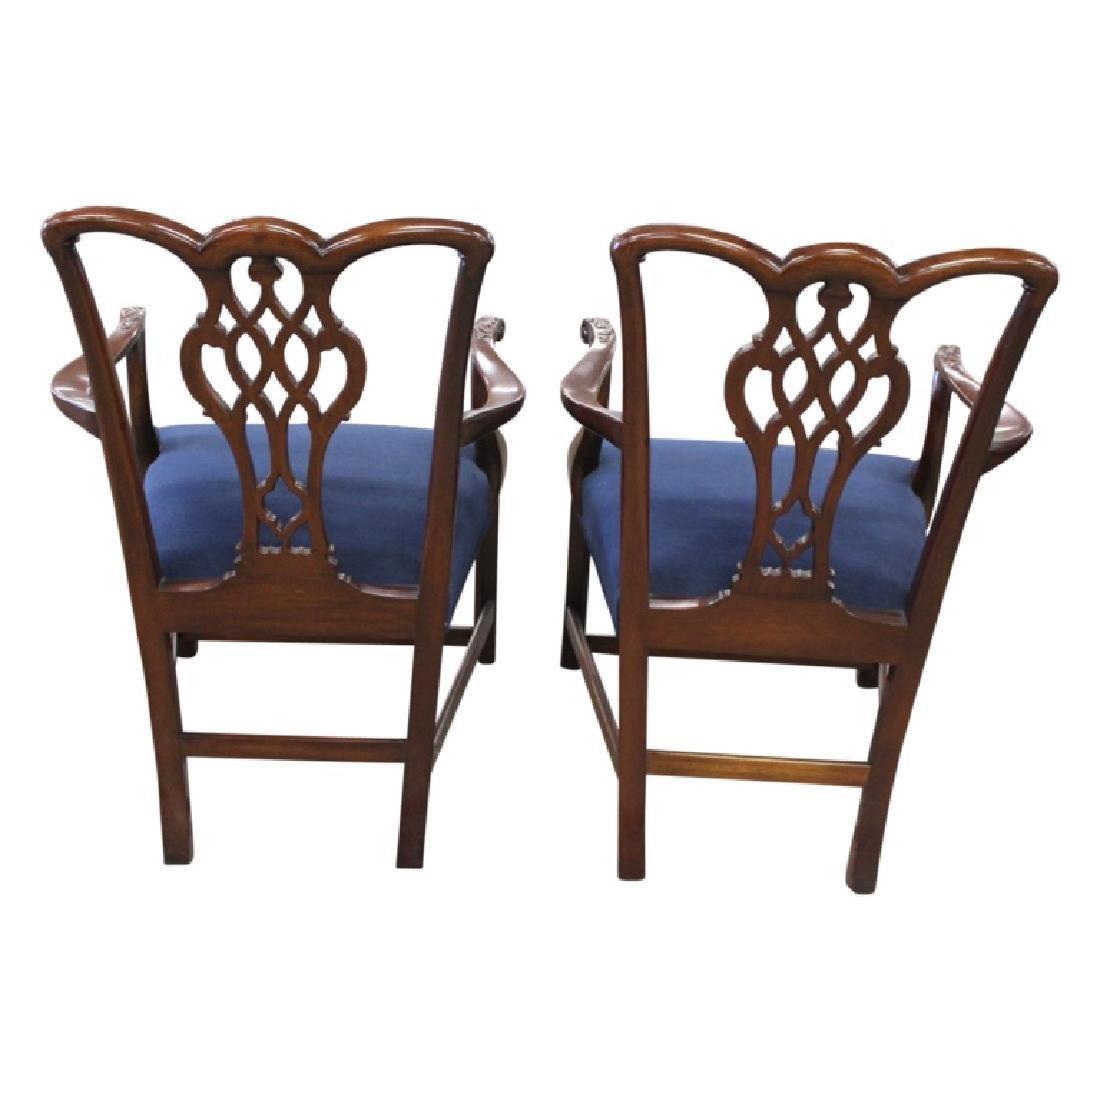 Schmieg & Kotztan Dining Chairs - 8 PCS - 5